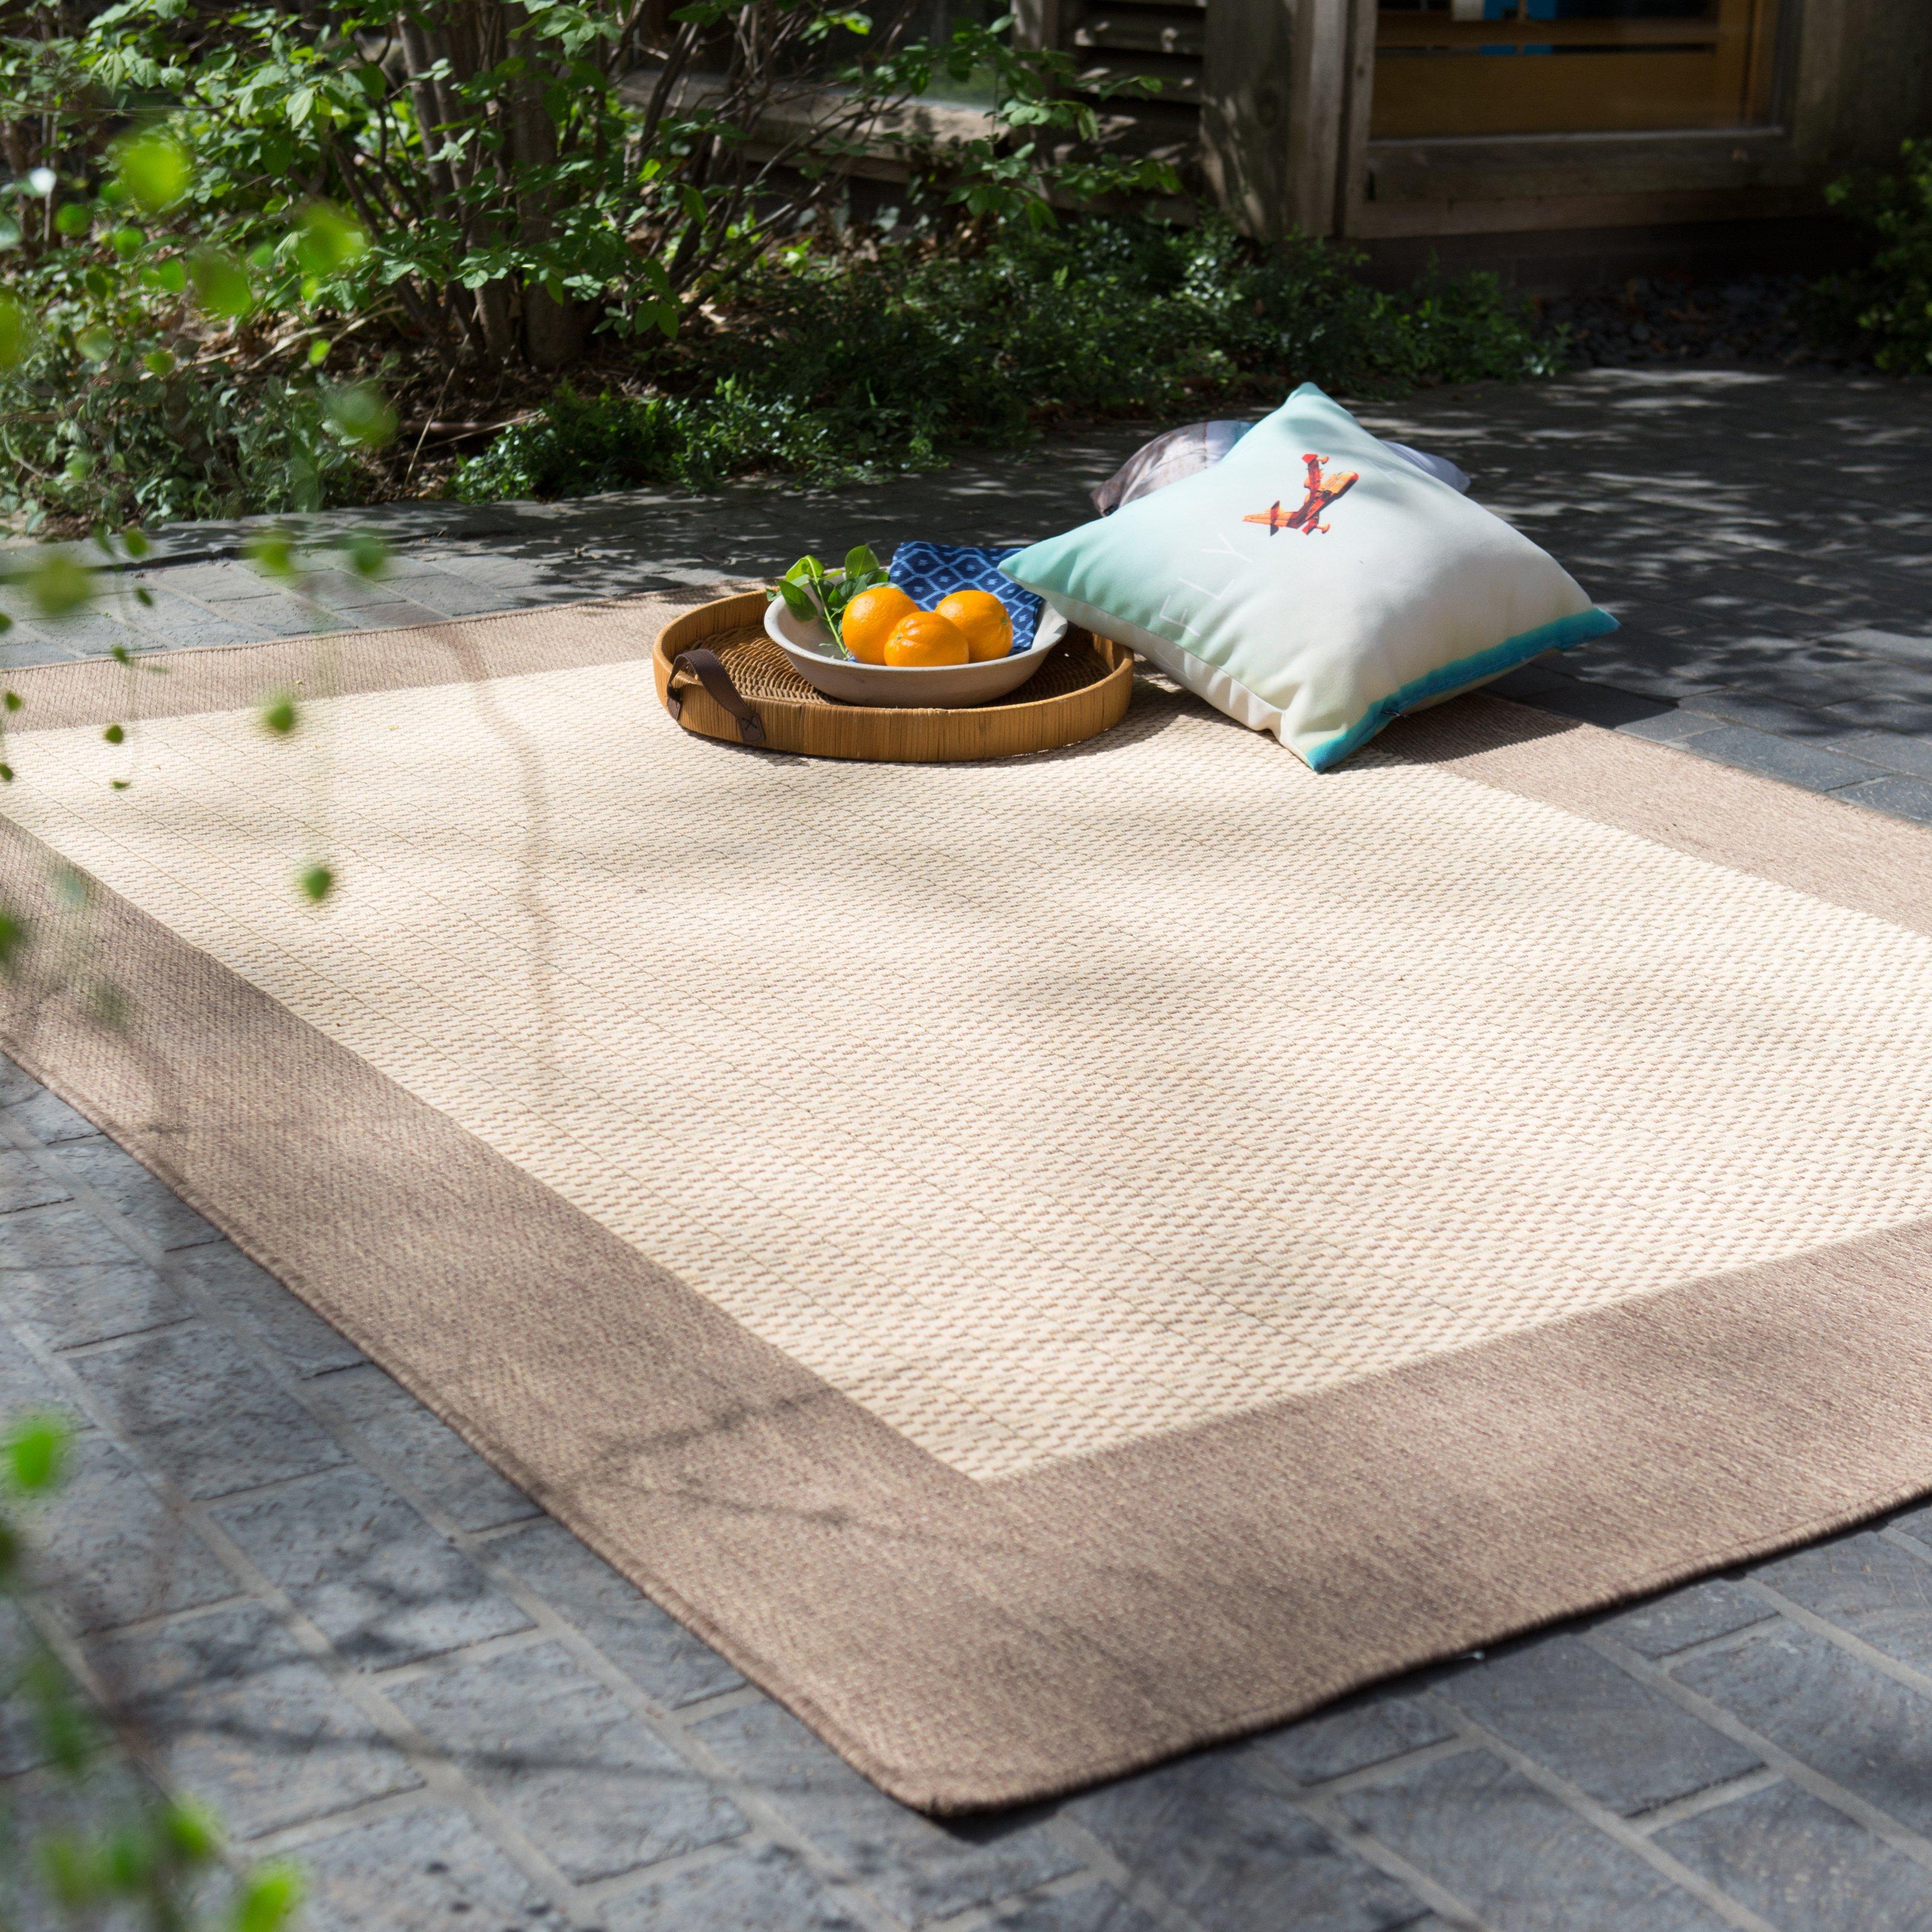 couristan recife checkered field indoor/outdoor area rug - natural/cocoa |  hayneedle KRWPZXO